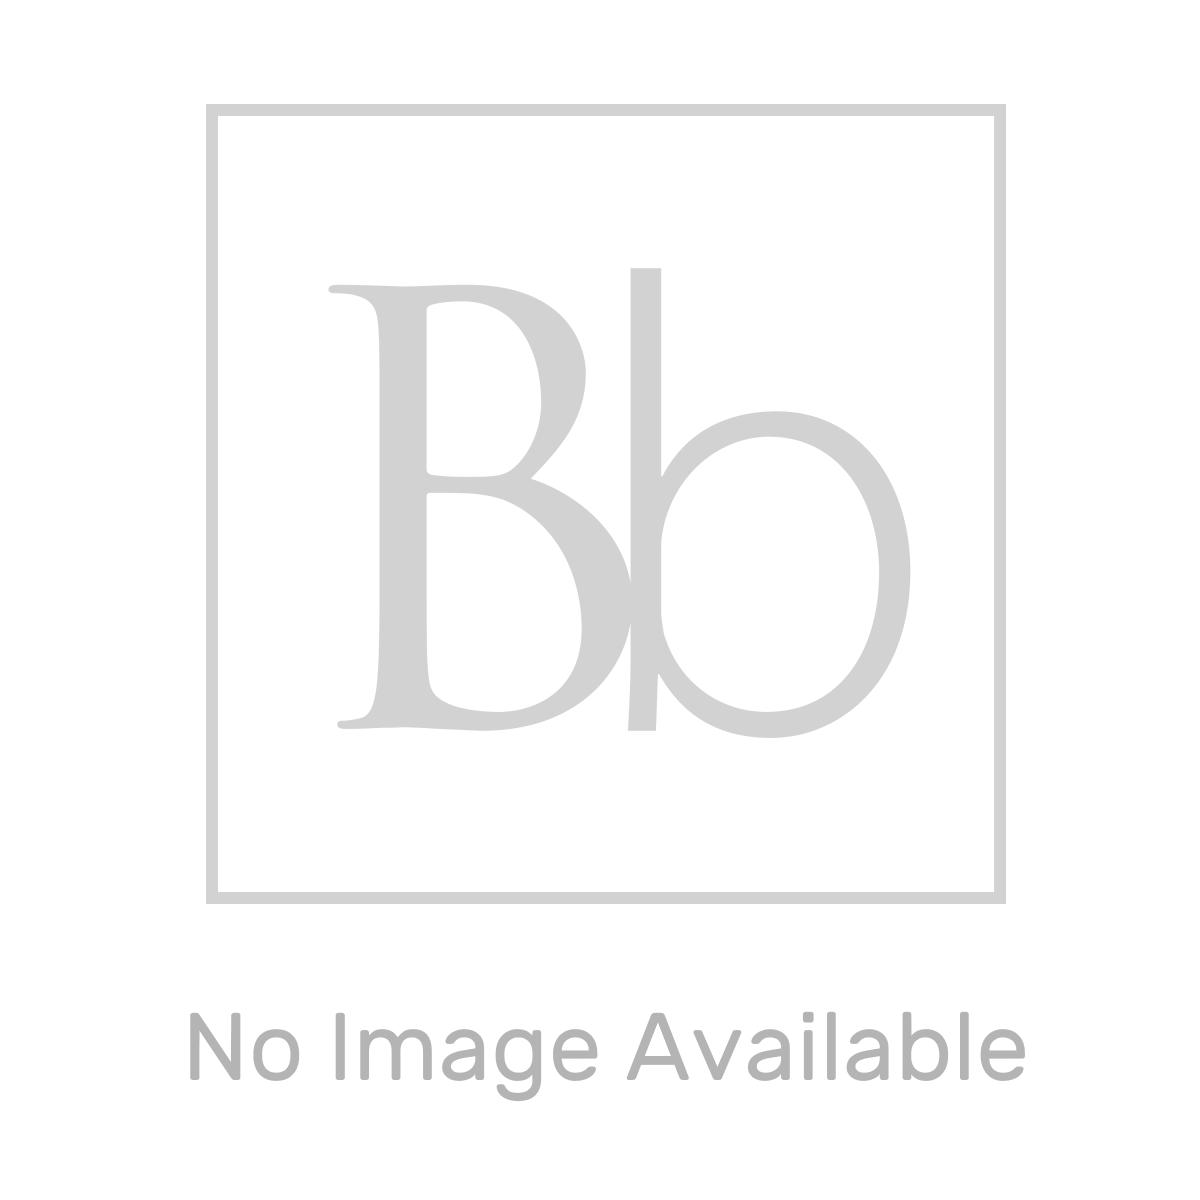 RAK Series 600 Wall Hung Gloss White Urinal